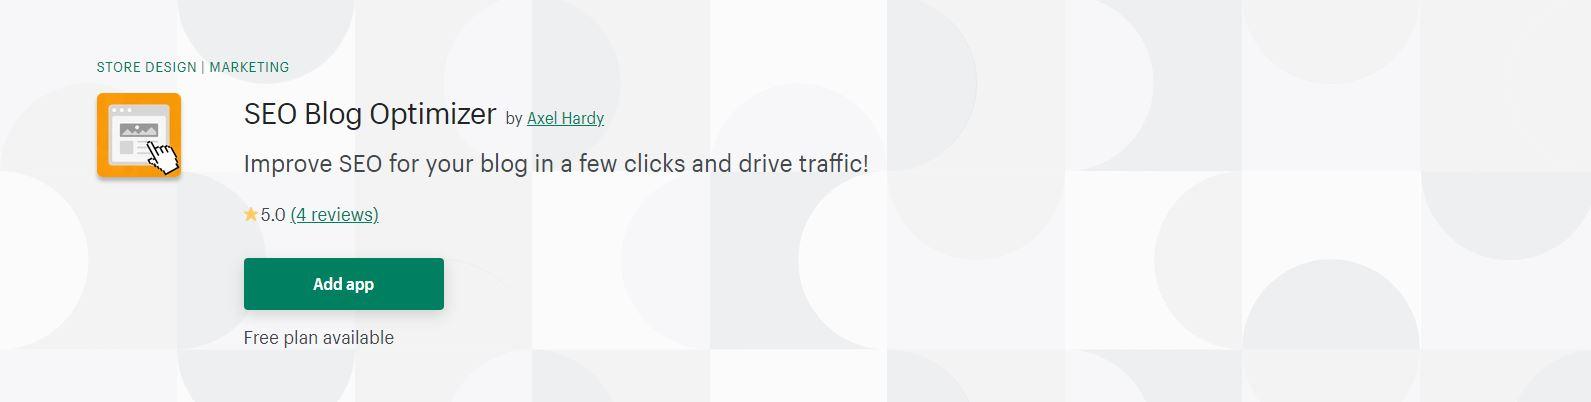 SEO Blog Optimizer